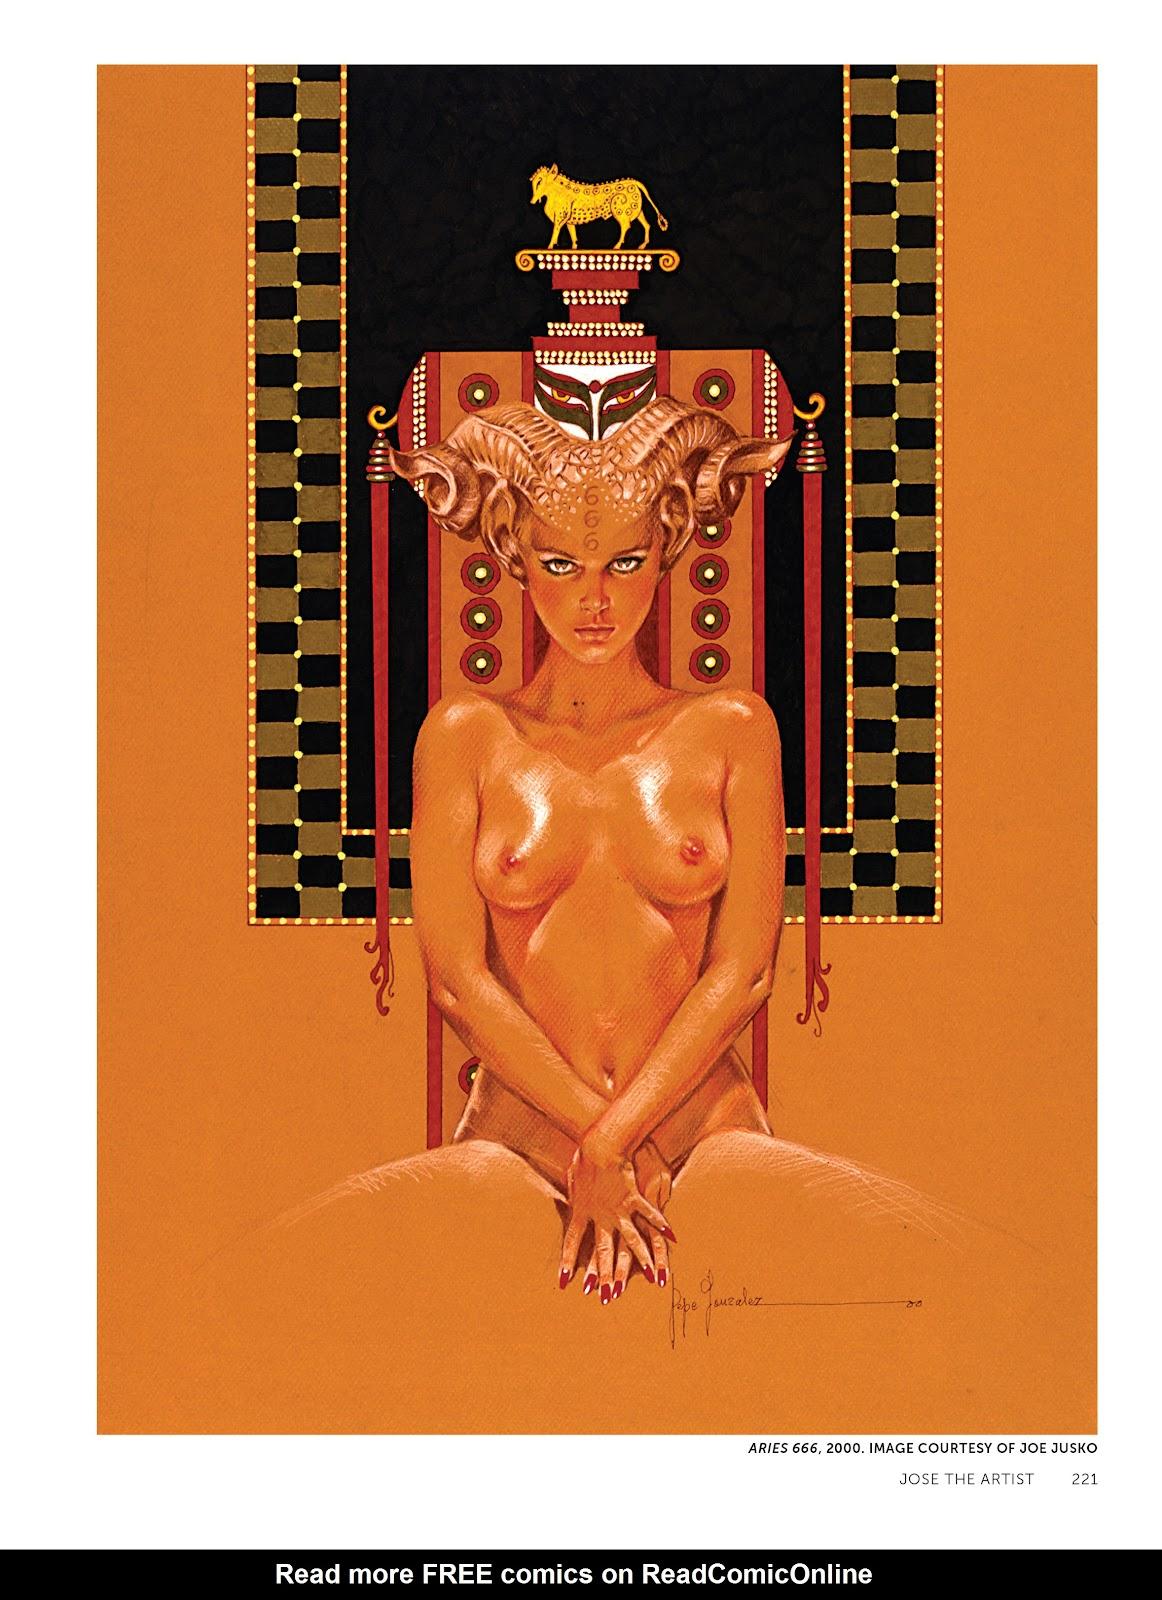 Read online The Art of Jose Gonzalez comic -  Issue # TPB (Part 3) - 24